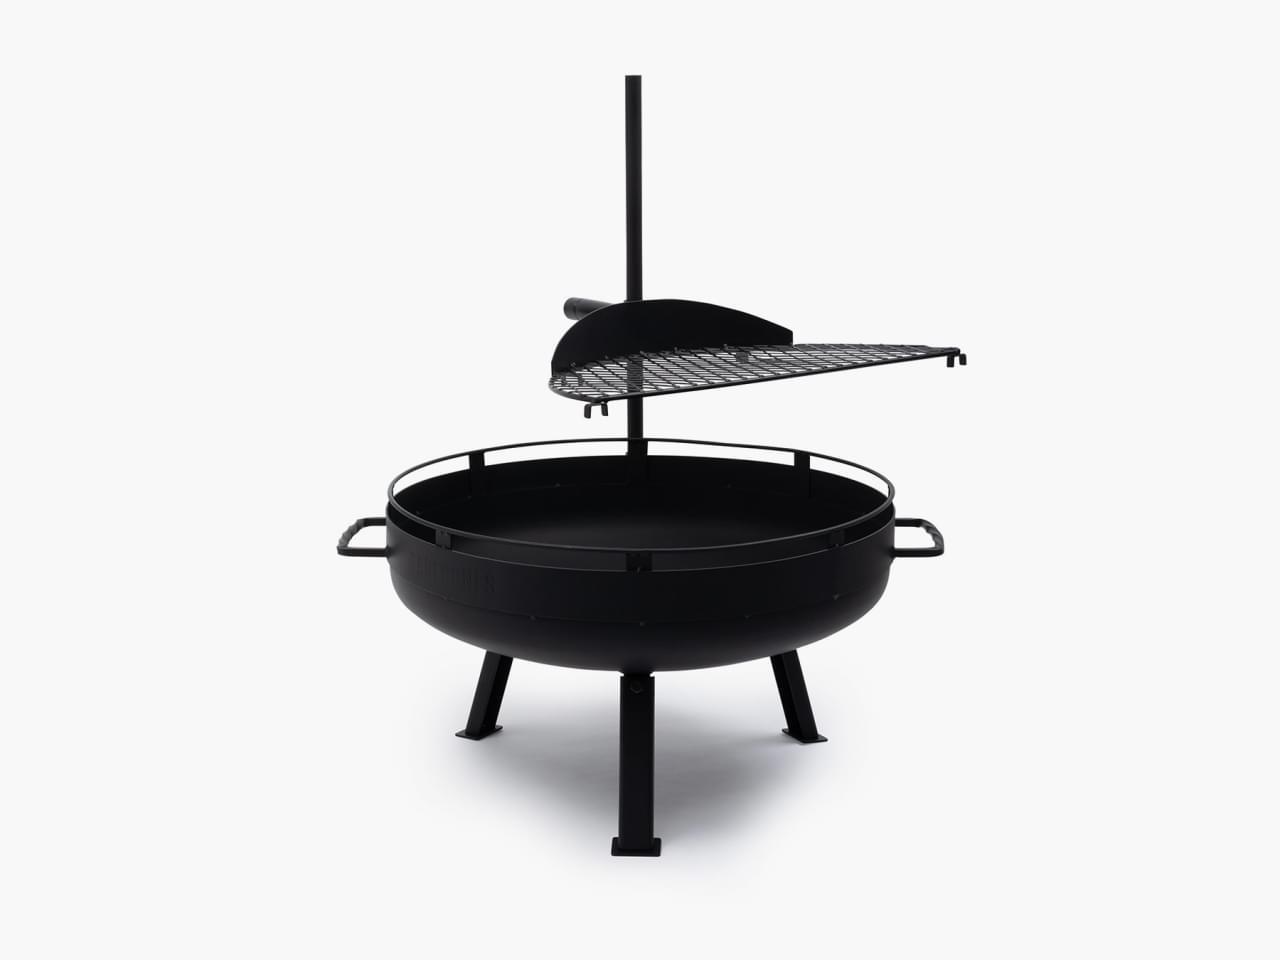 Barebones Cowboy Fire Pit Grill System Buitenkeuken Small